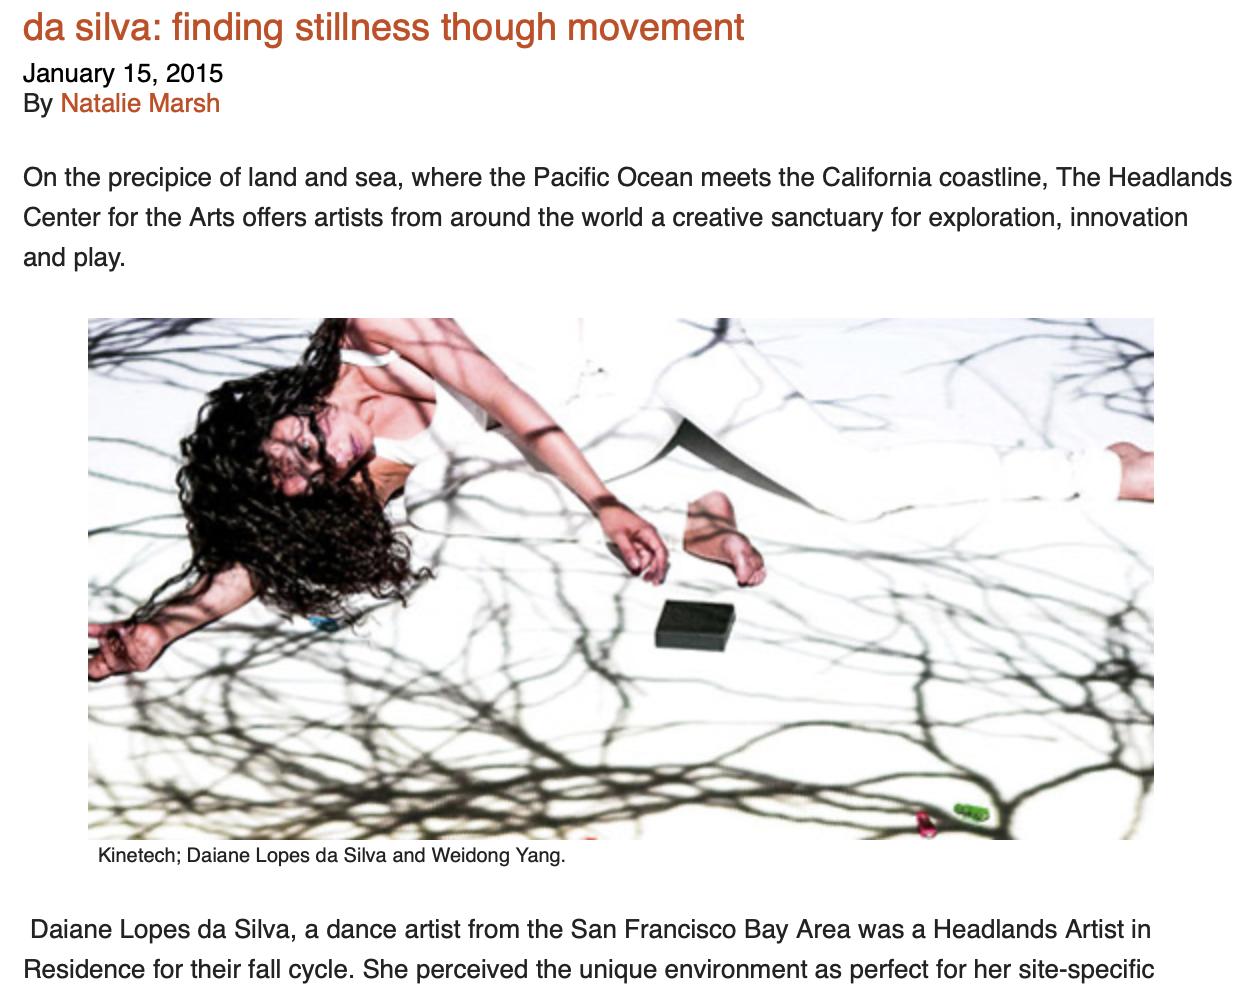 Interview with Daiane Lopes da Silva - da silva: finding stillness though movement